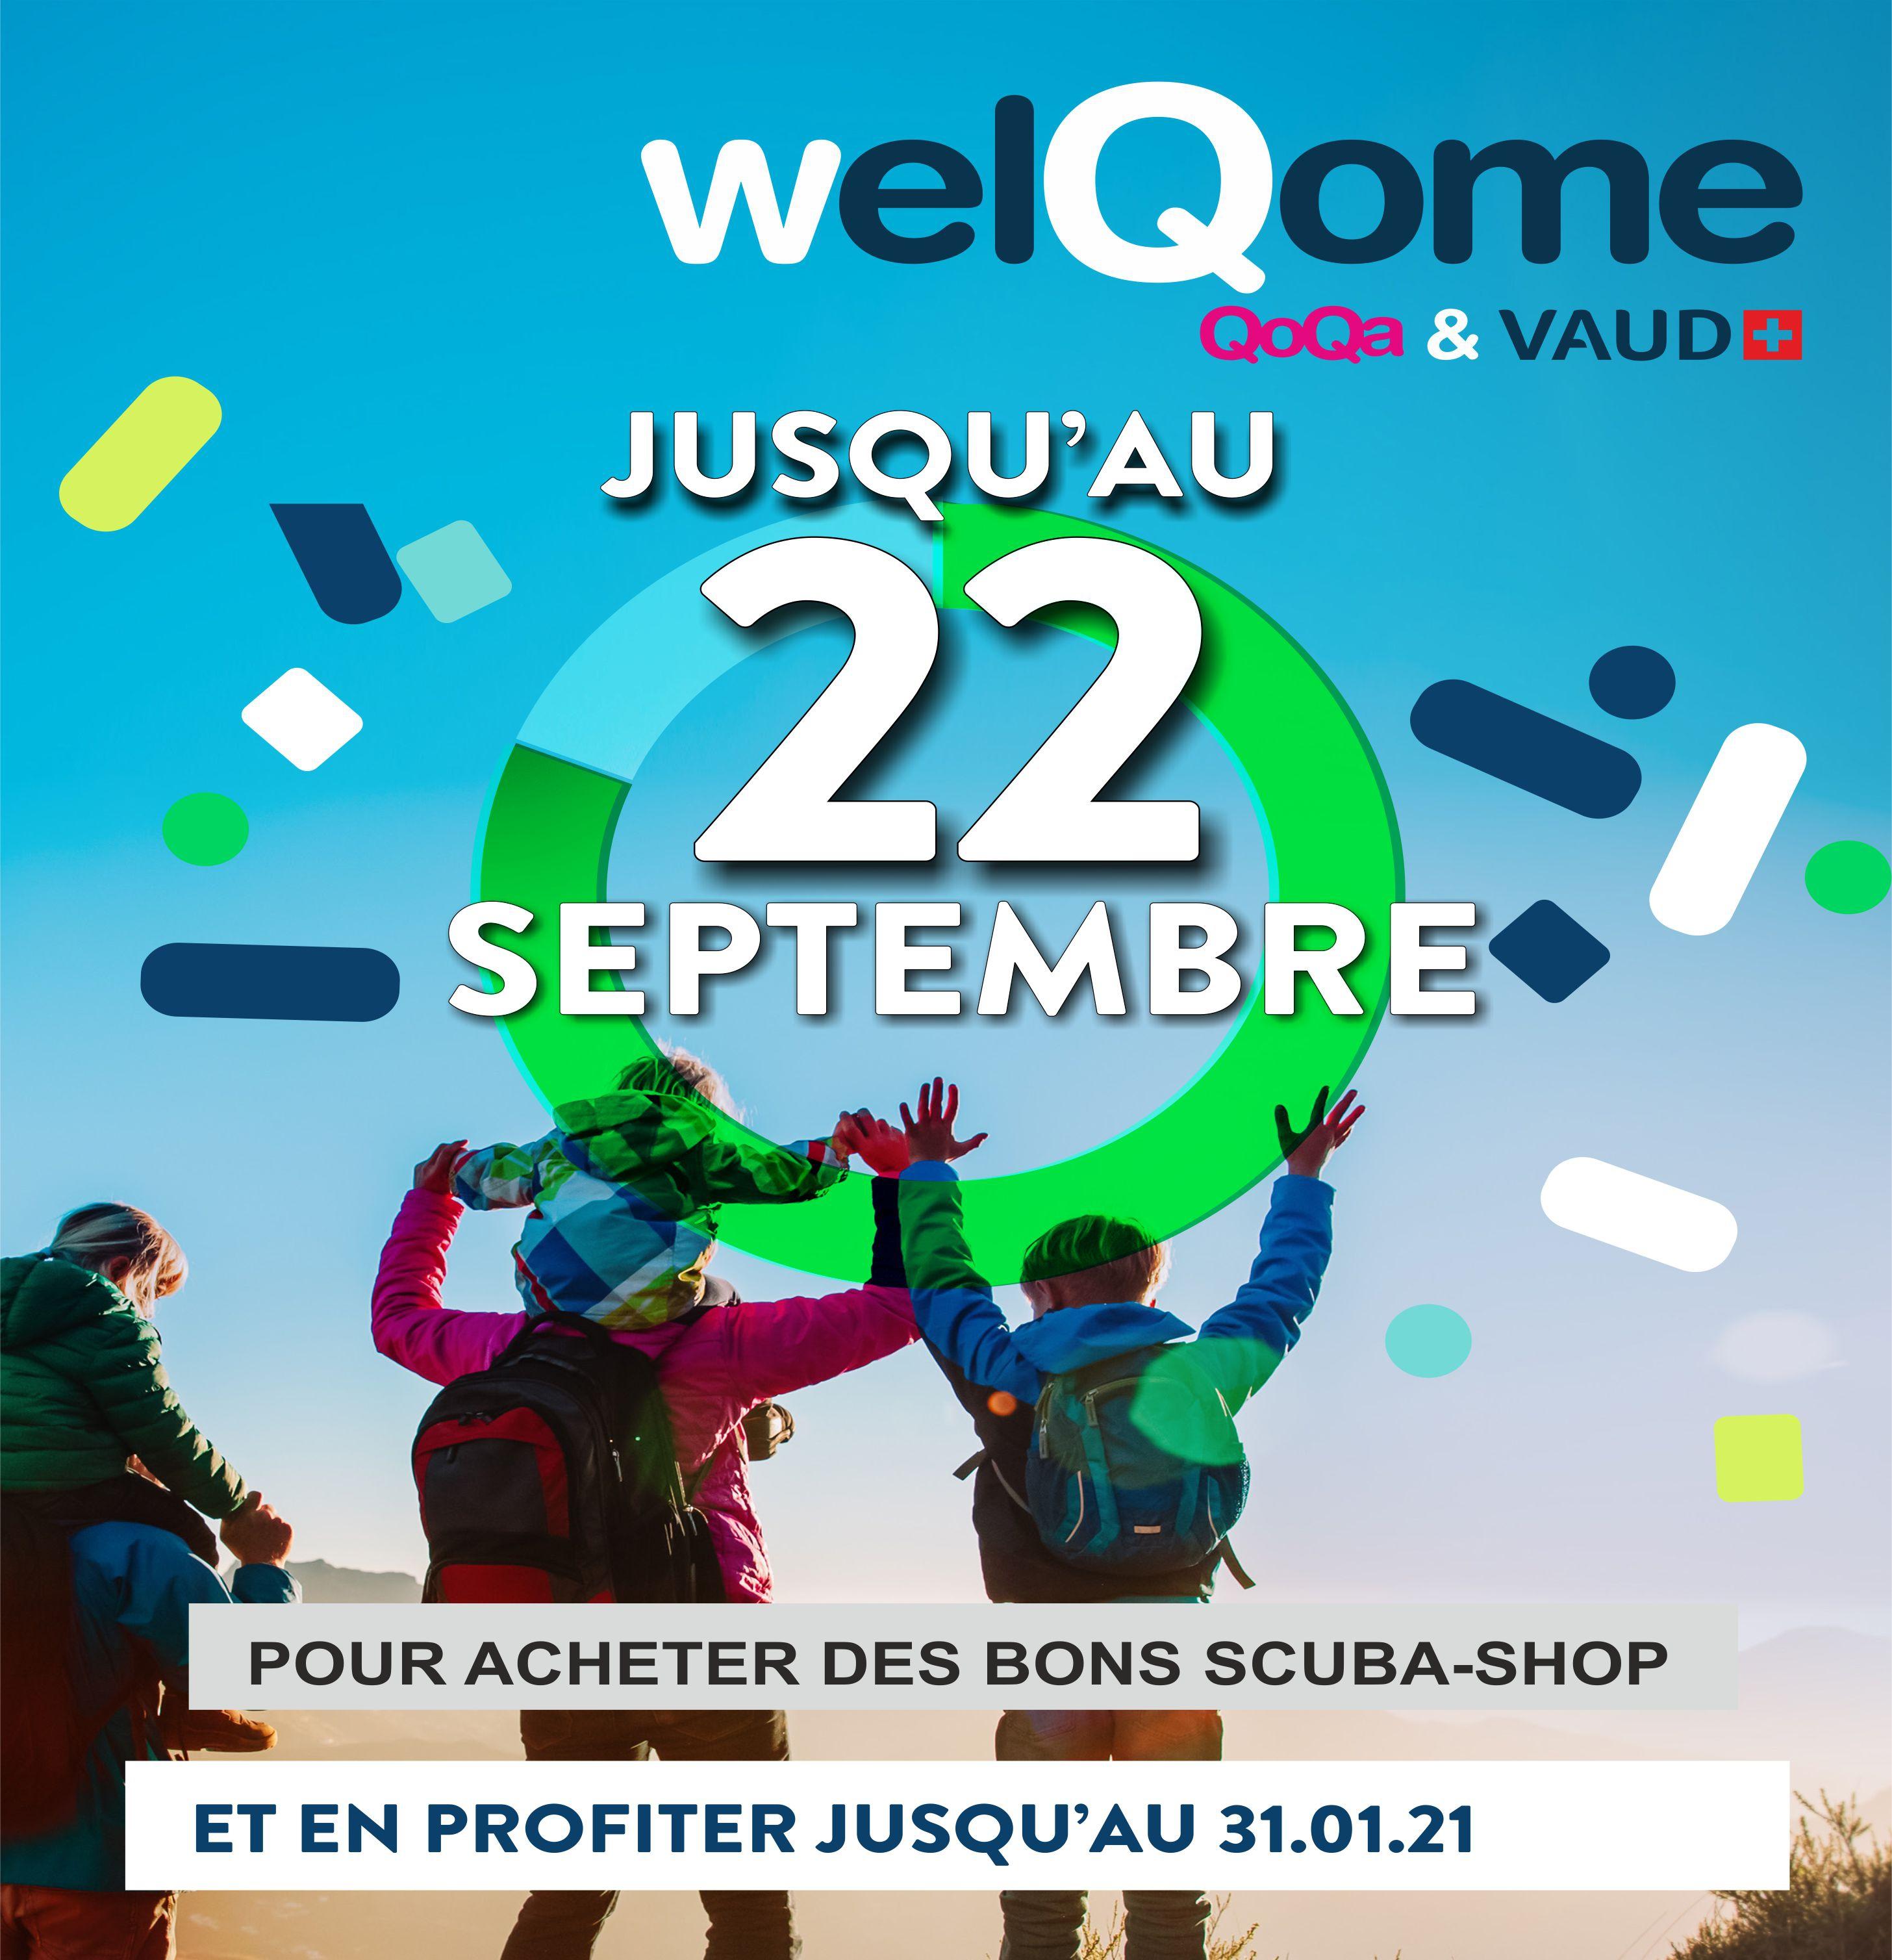 Welqome-franz